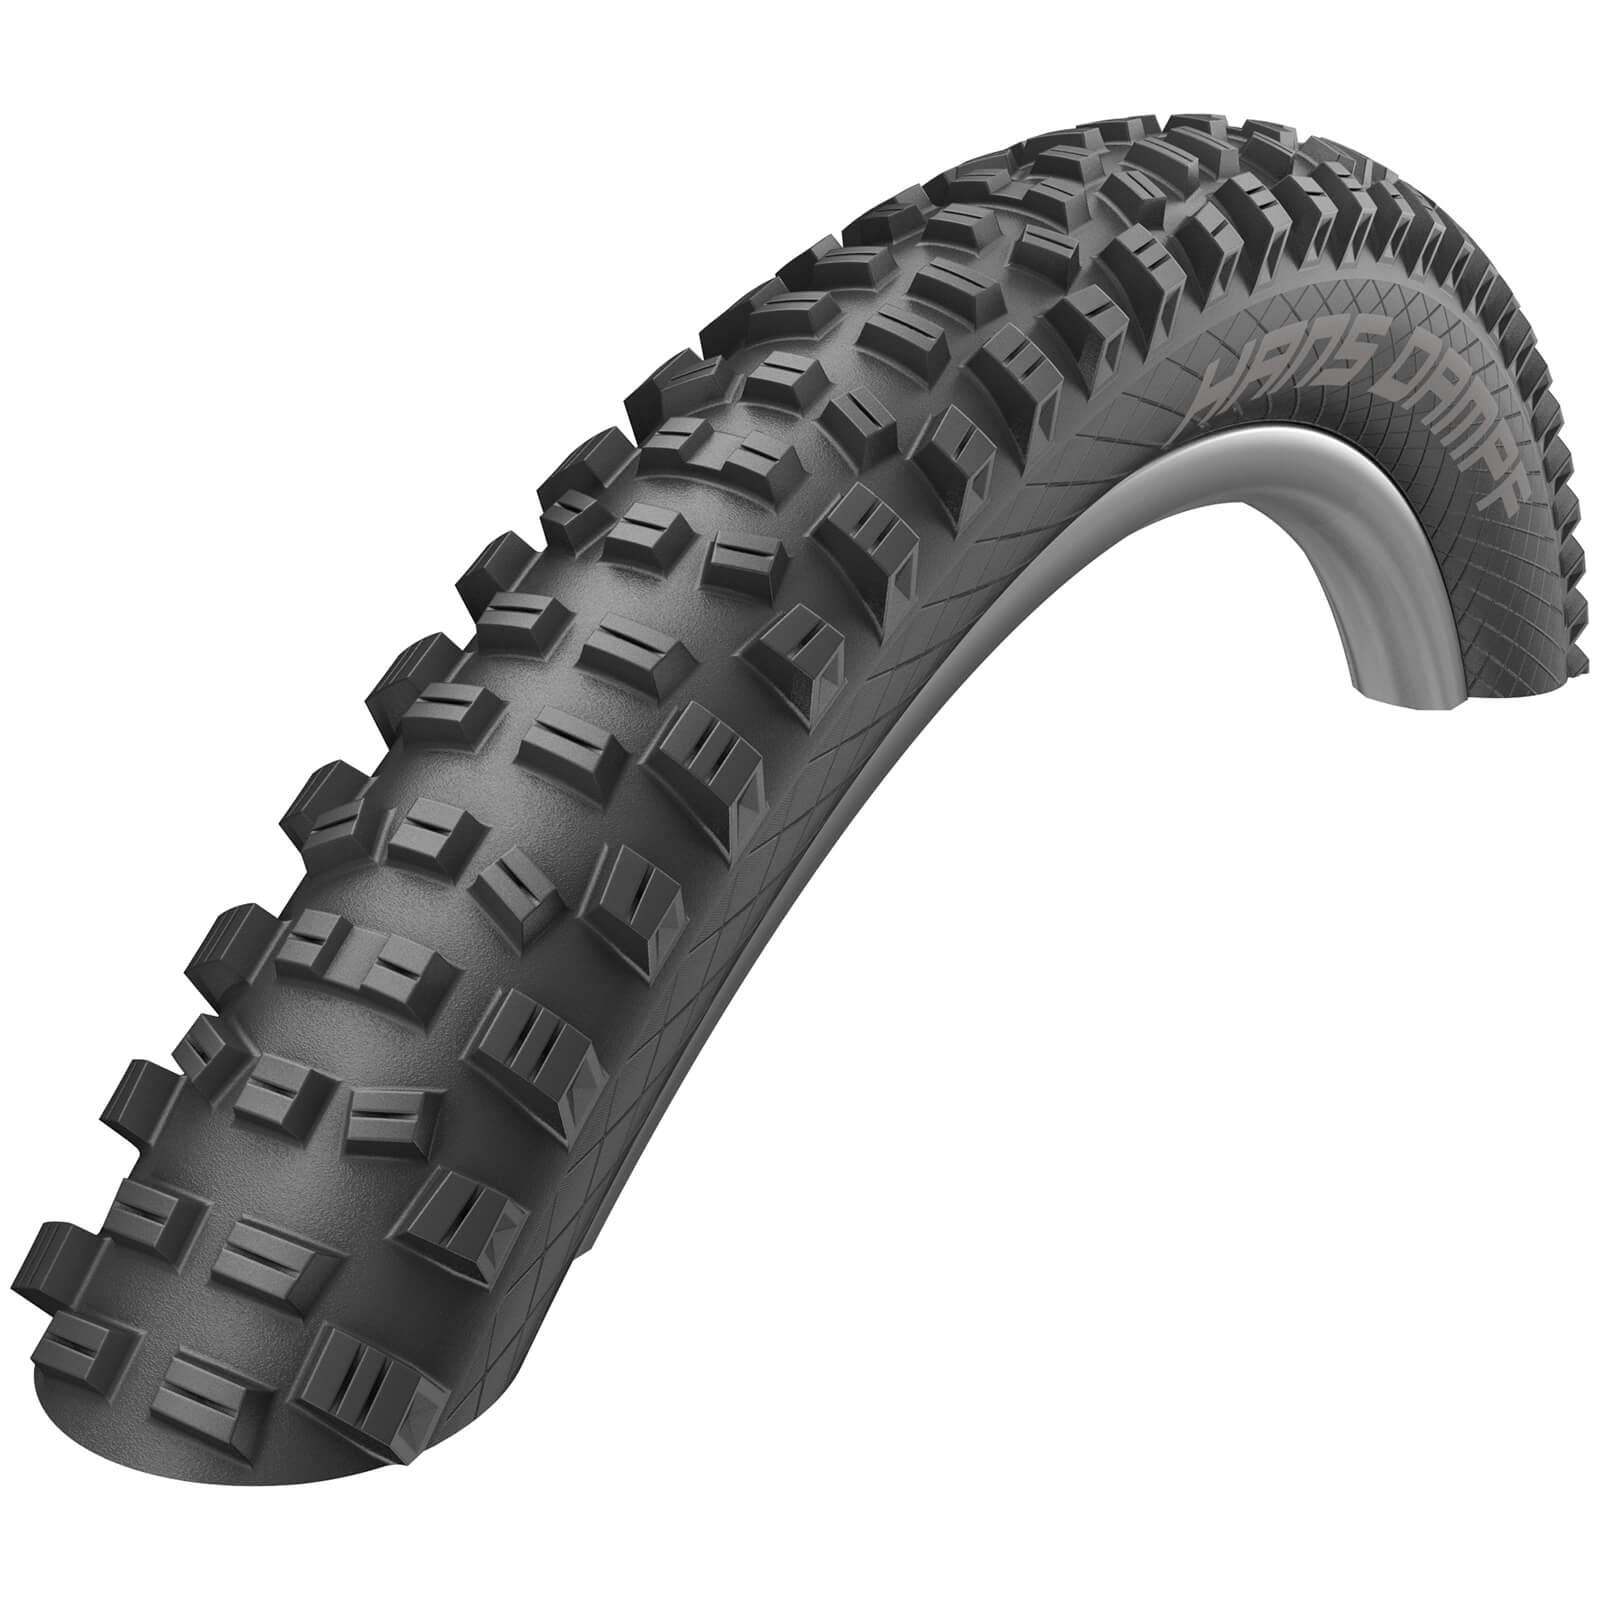 Schwalbe Hans Dampf Evo Super Trail Tubeless MTB Tyre - 29in x 2.35in - Classic Skin